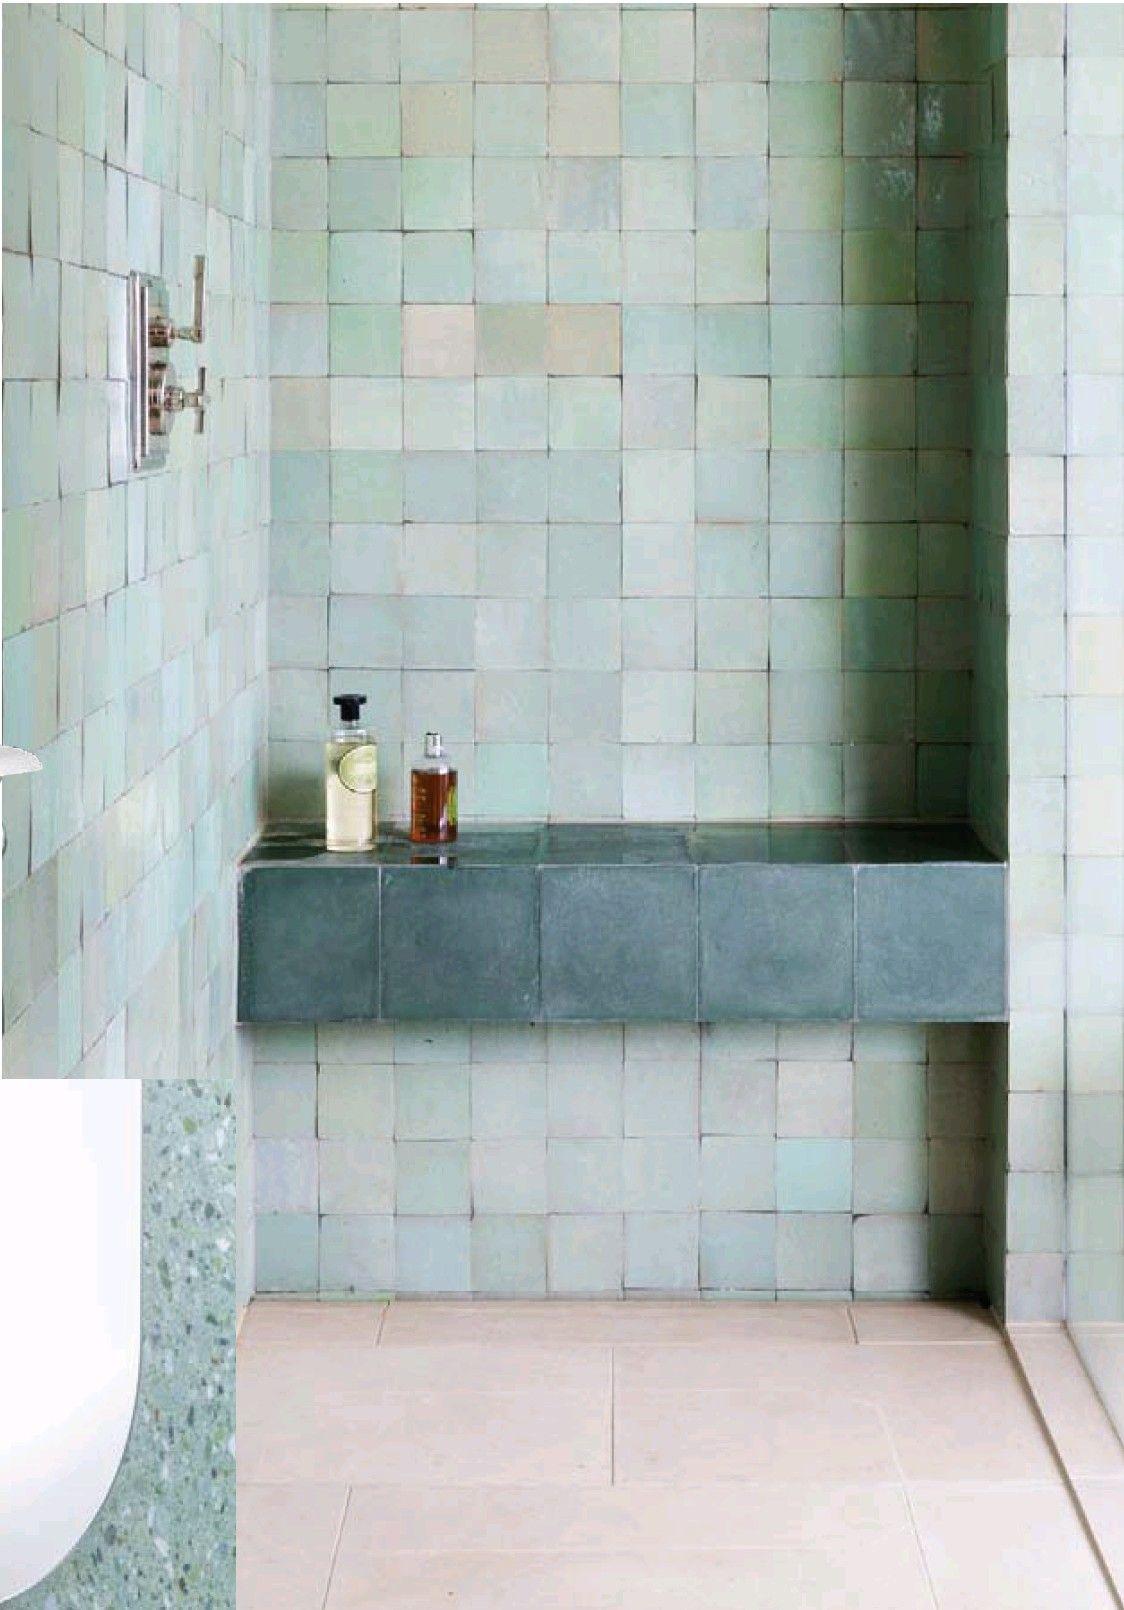 zellige tiles bathroom inspiration